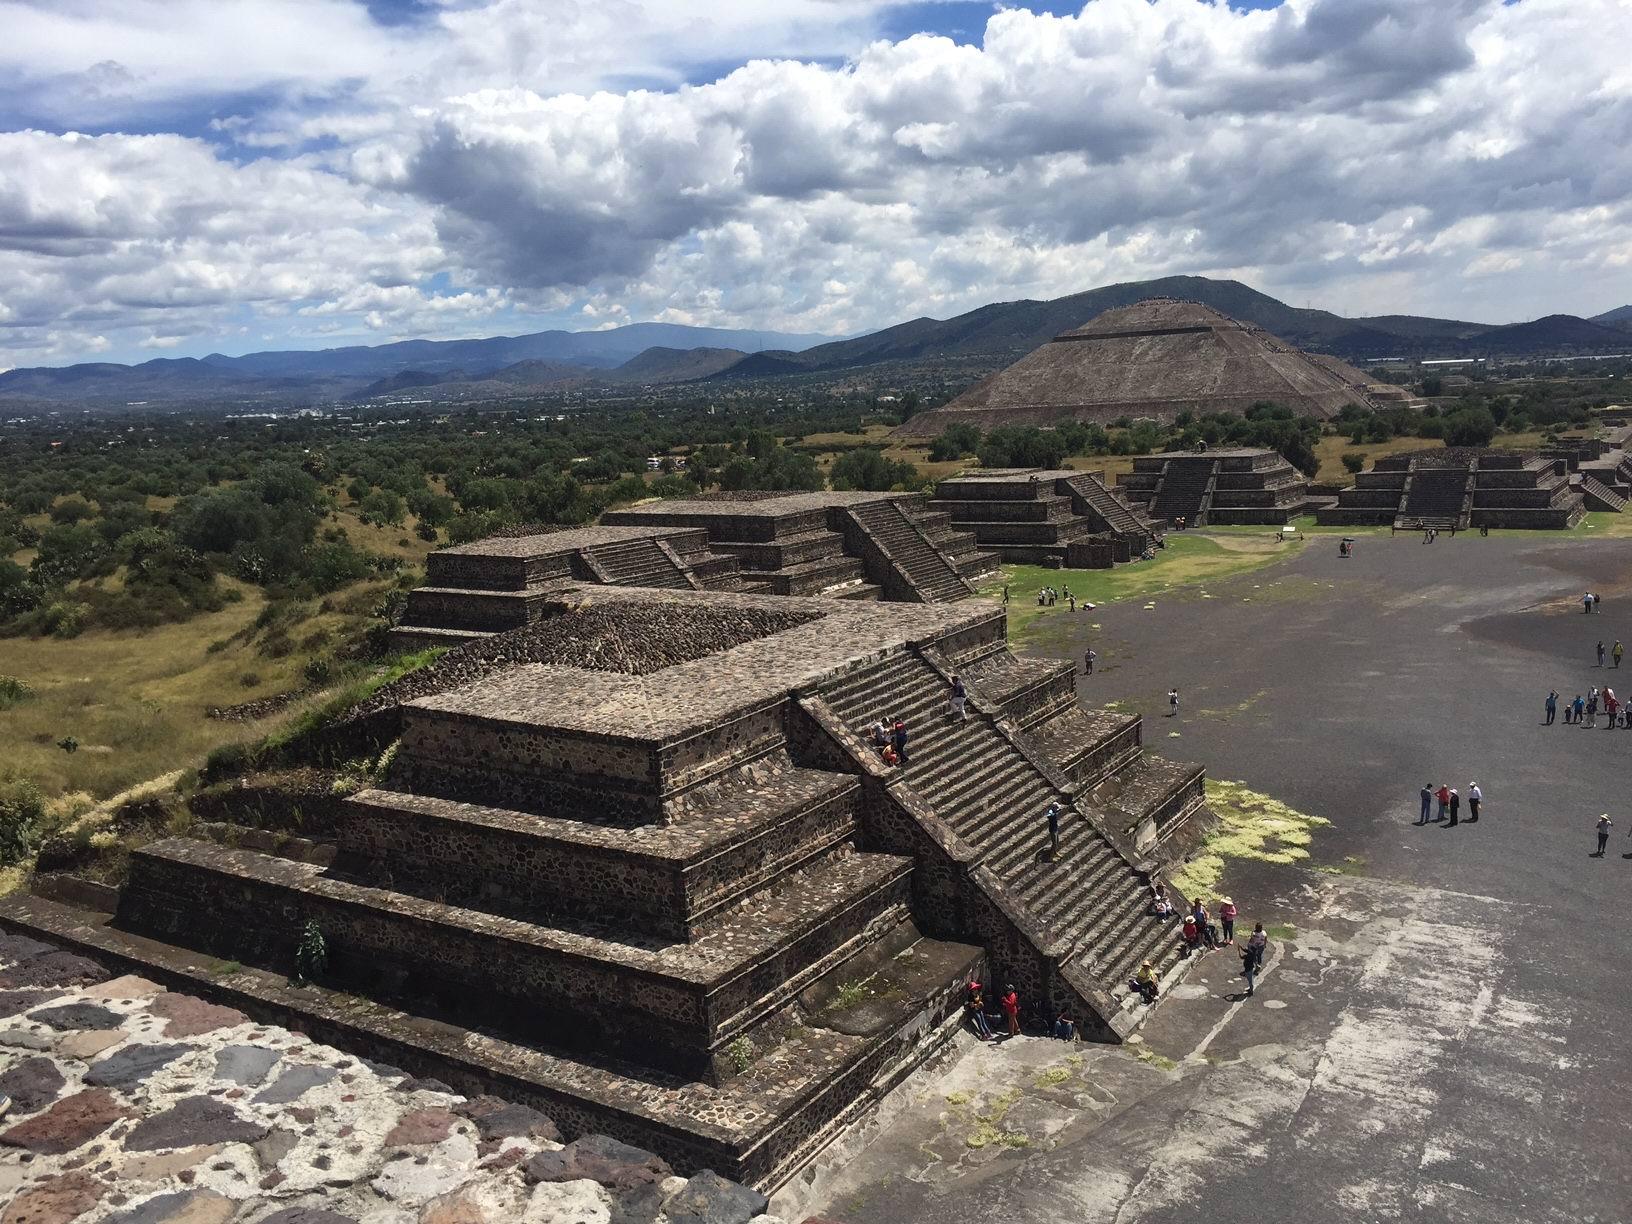 картинка фотография курорта Теотиуакан в Мексике